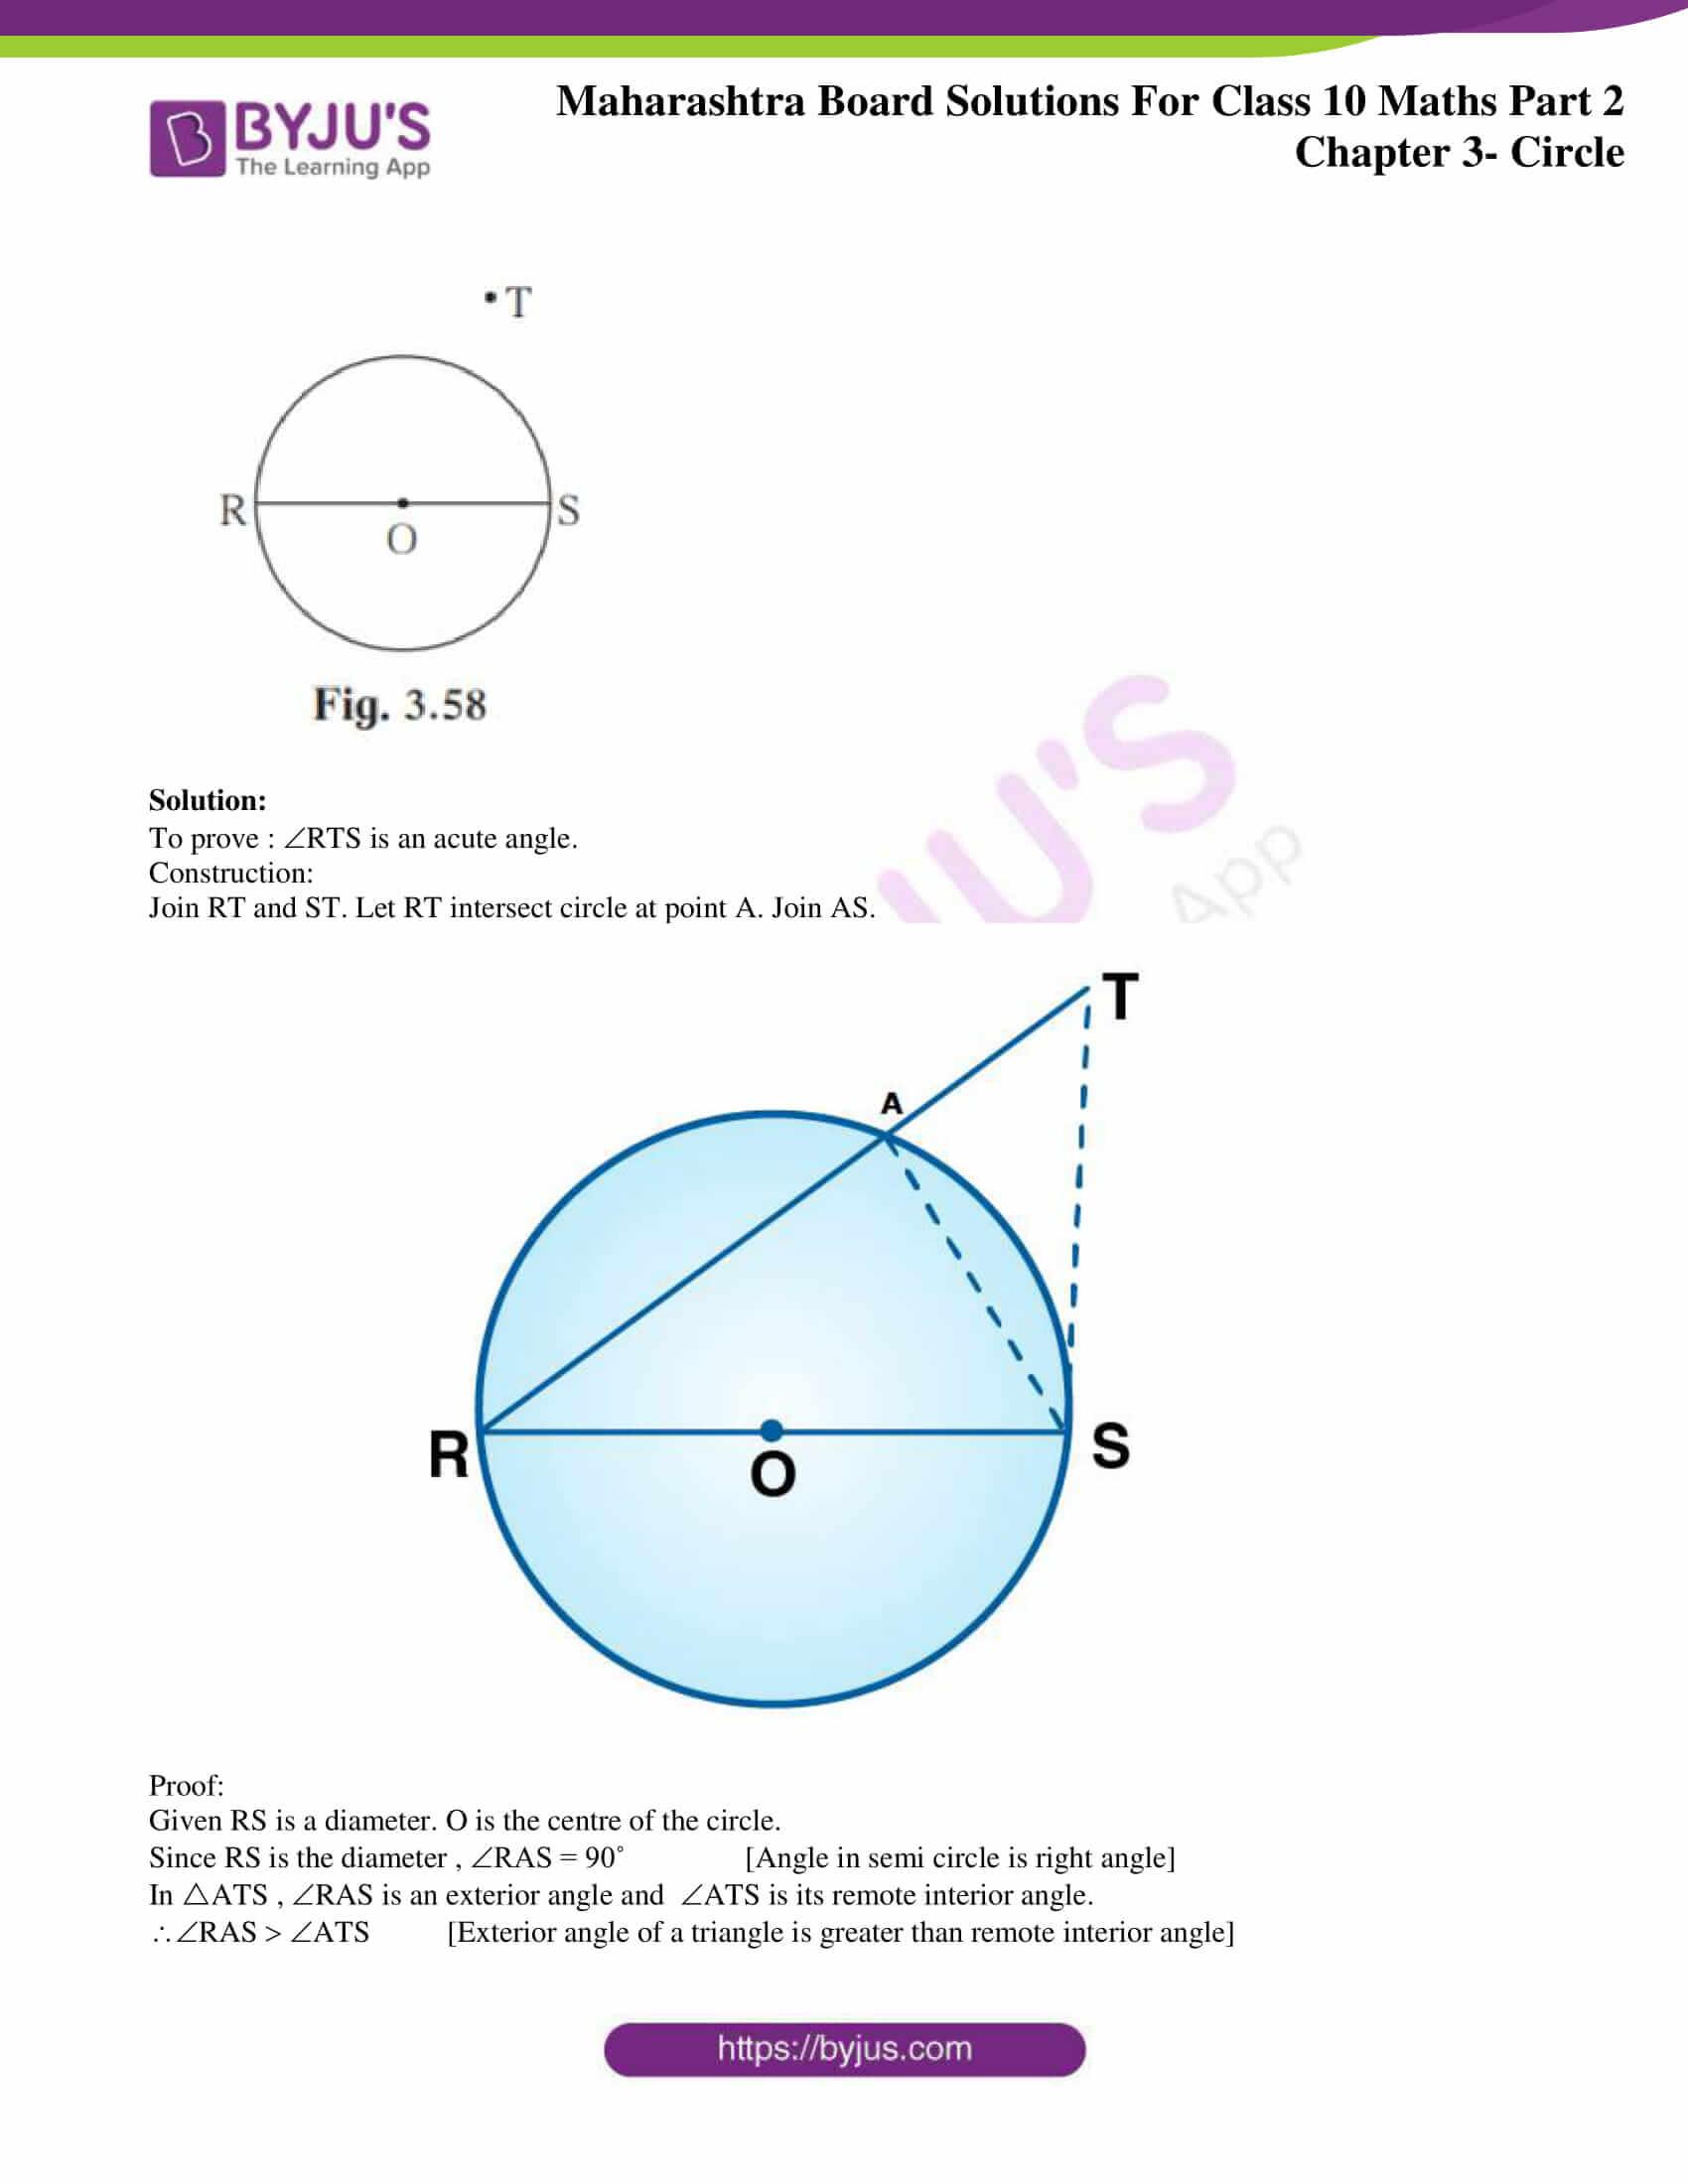 msbshse sol class 10 maths part 2 chapter 3 12